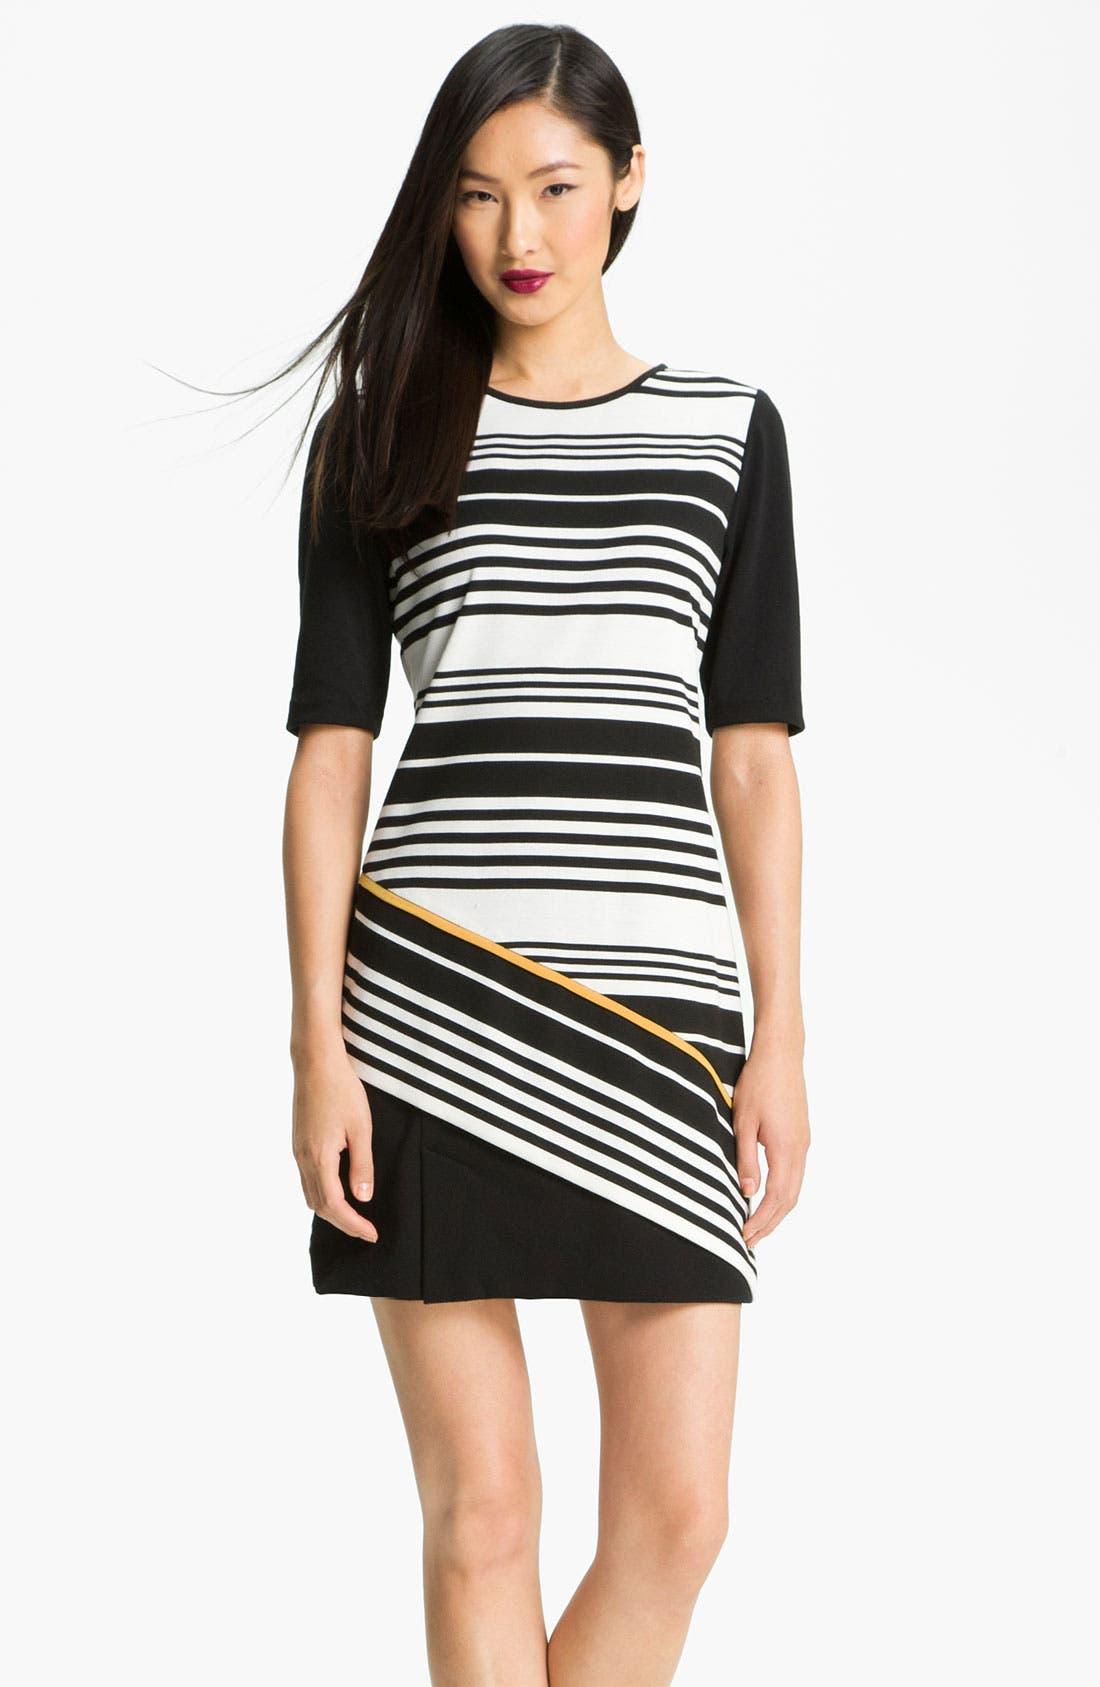 Alternate Image 1 Selected - Donna Ricco Colorblock Stripe Ponte Shift Dress (Petite)